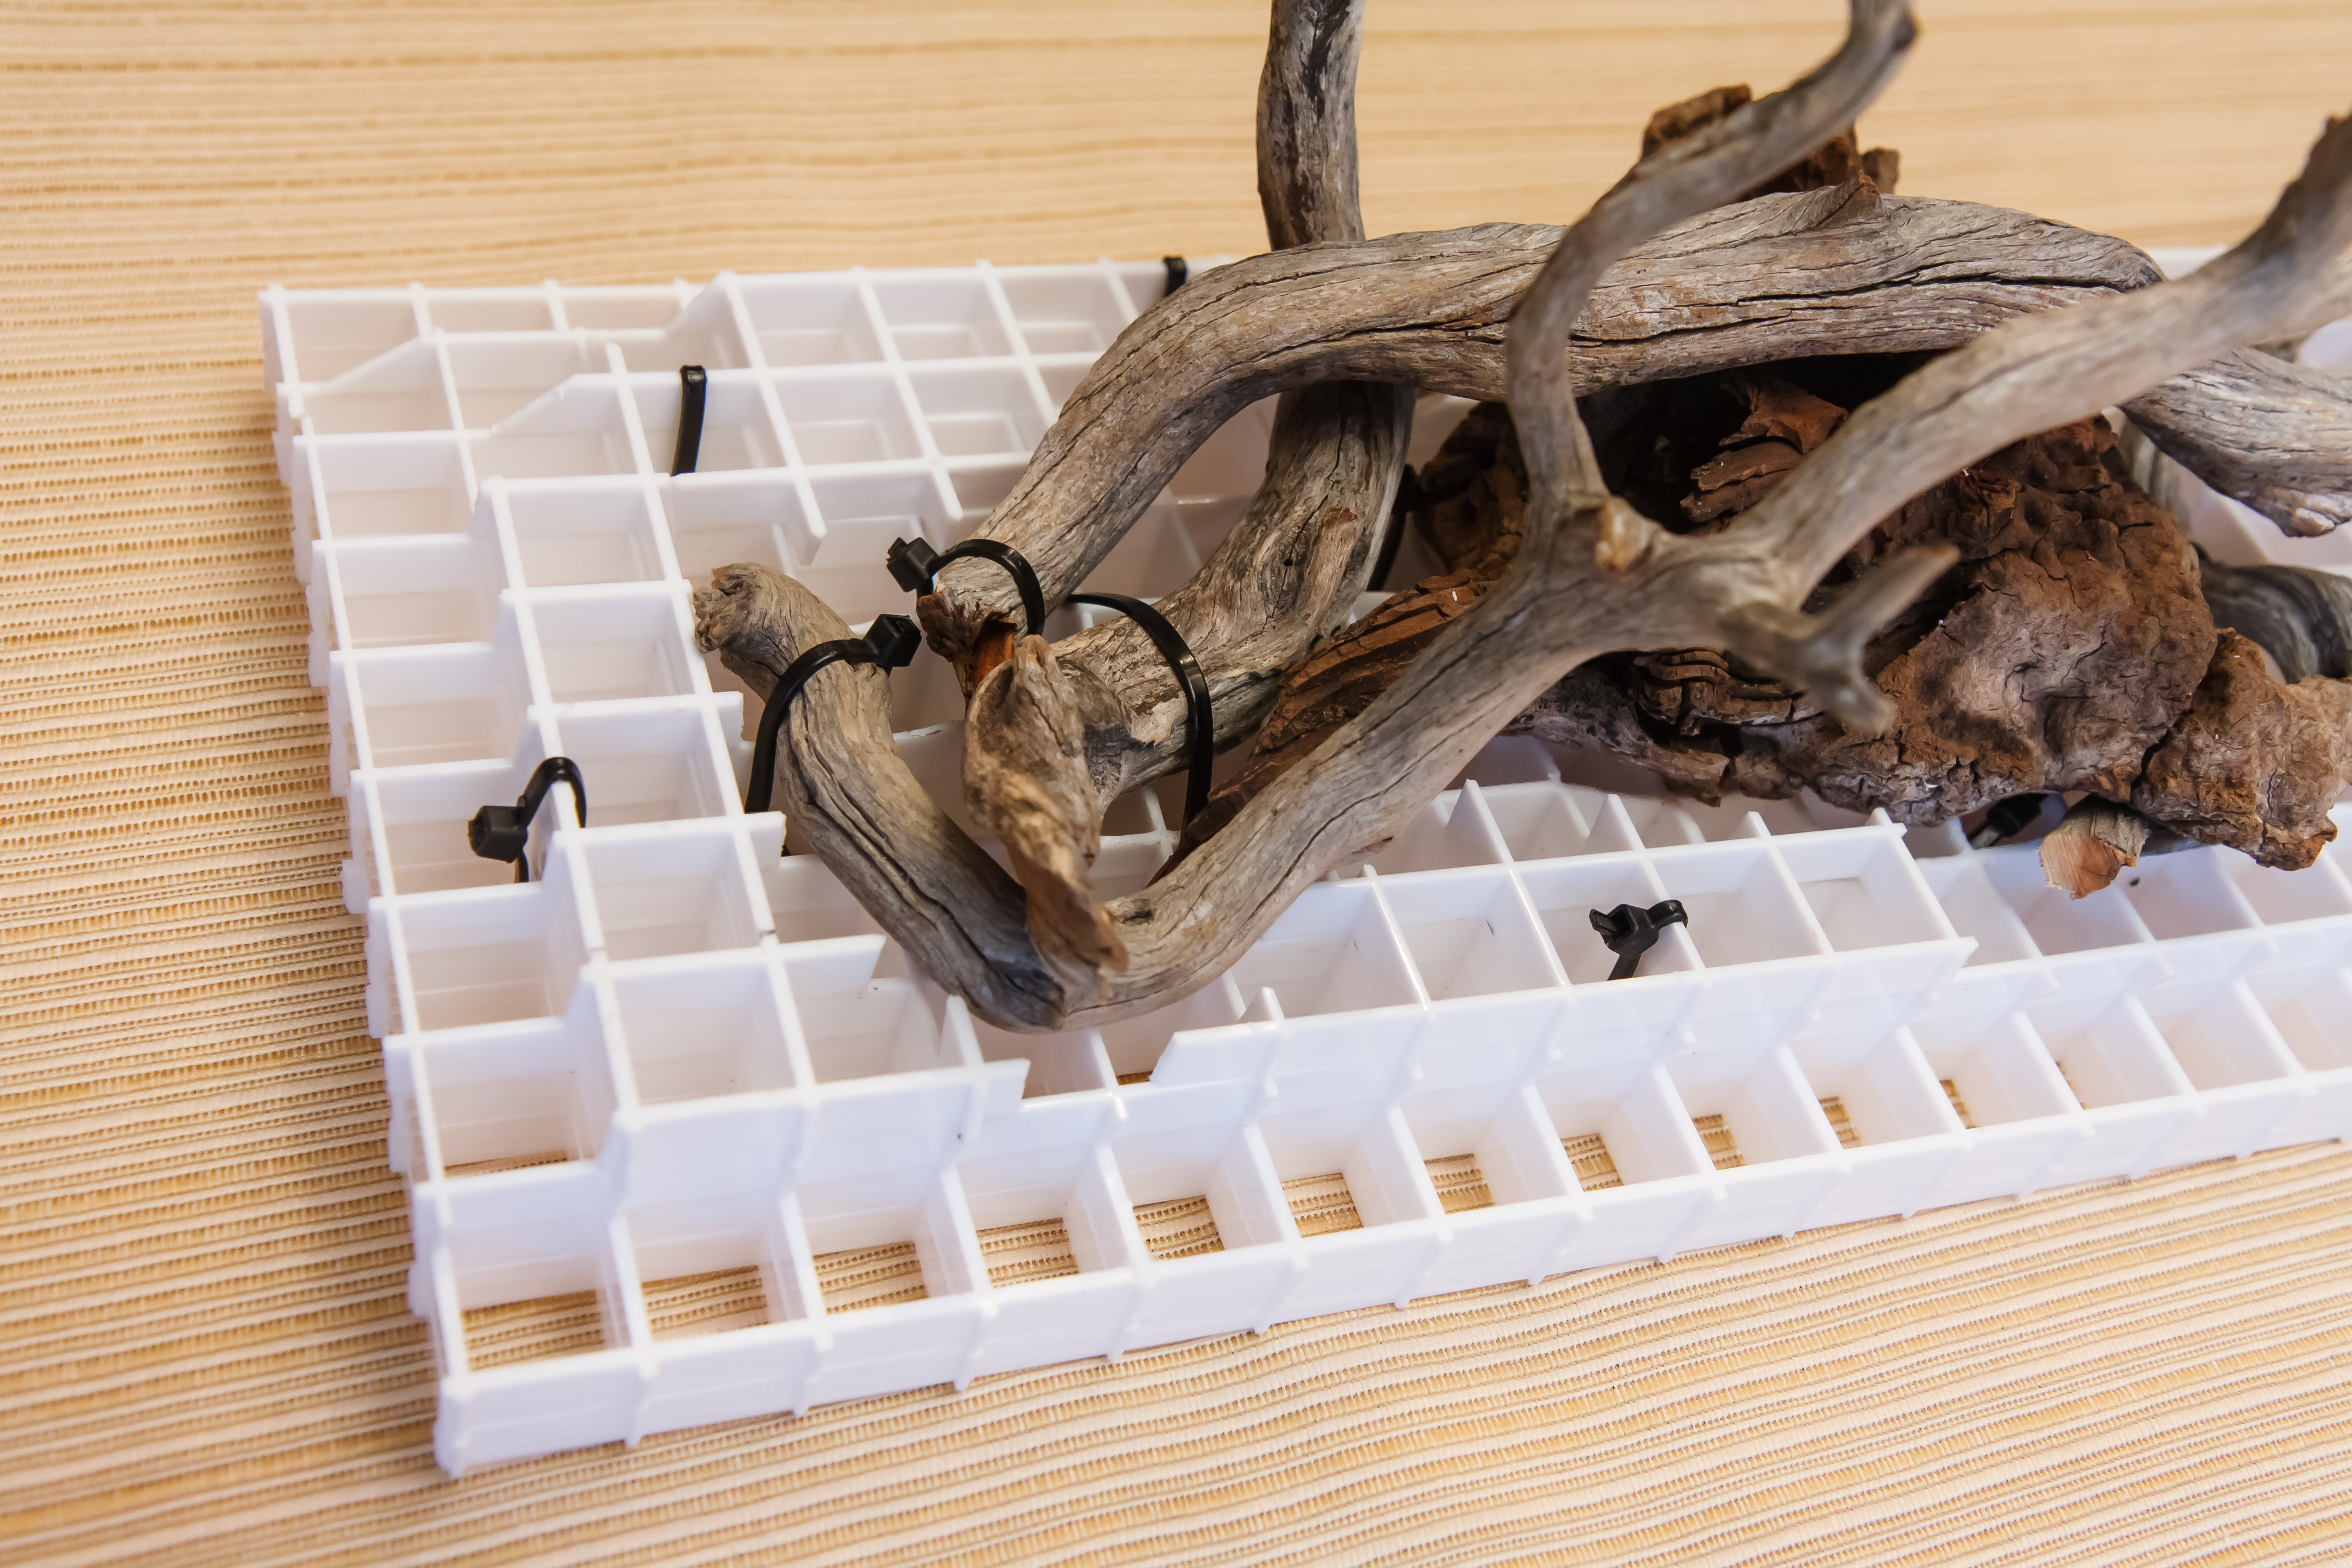 How To Secure Aquarium Driftwood Using Eggcrate Light Grid